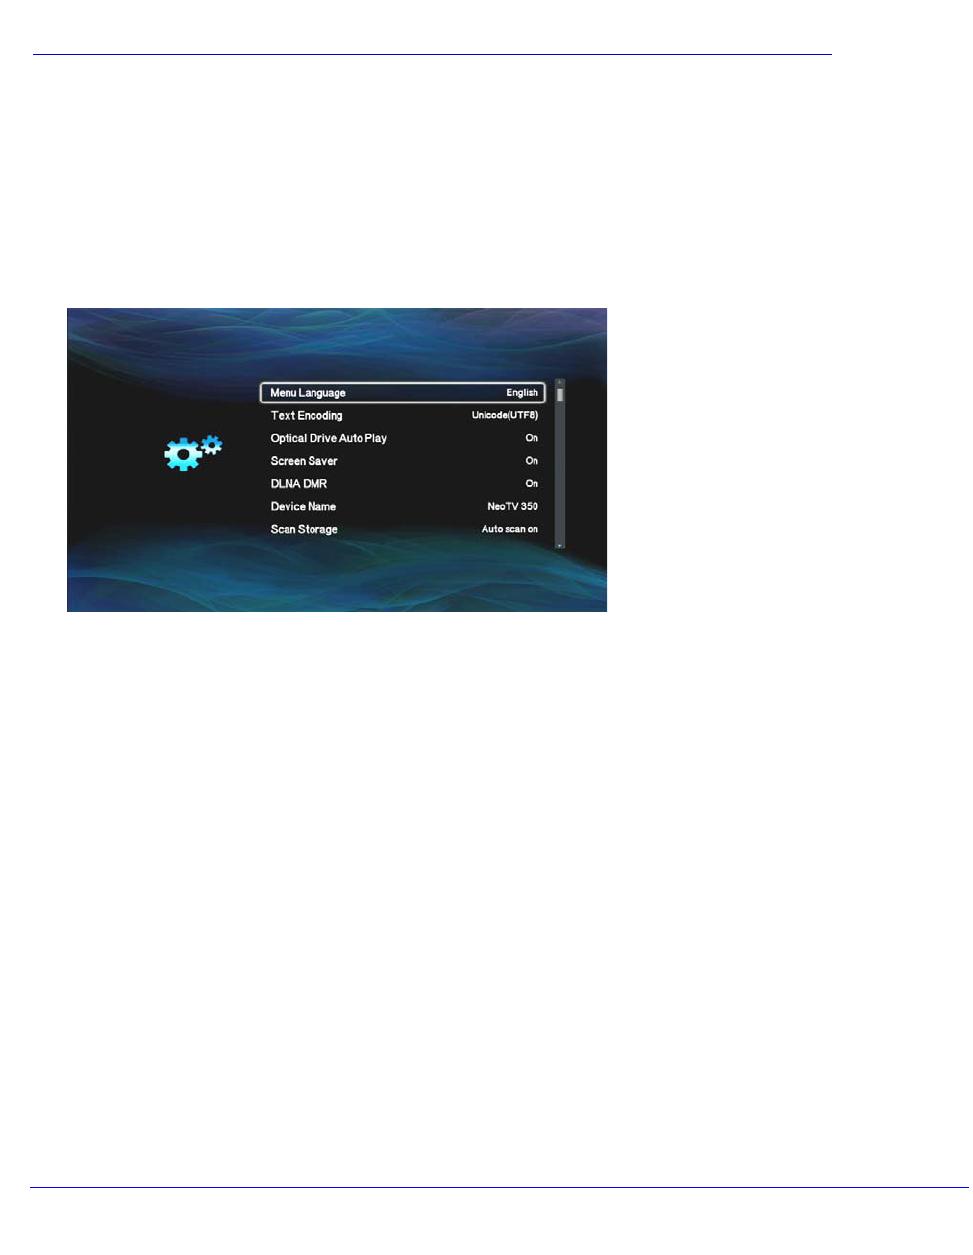 Handleiding Netgear NeoTV 350 HD - NTV350 (pagina 31 van 39